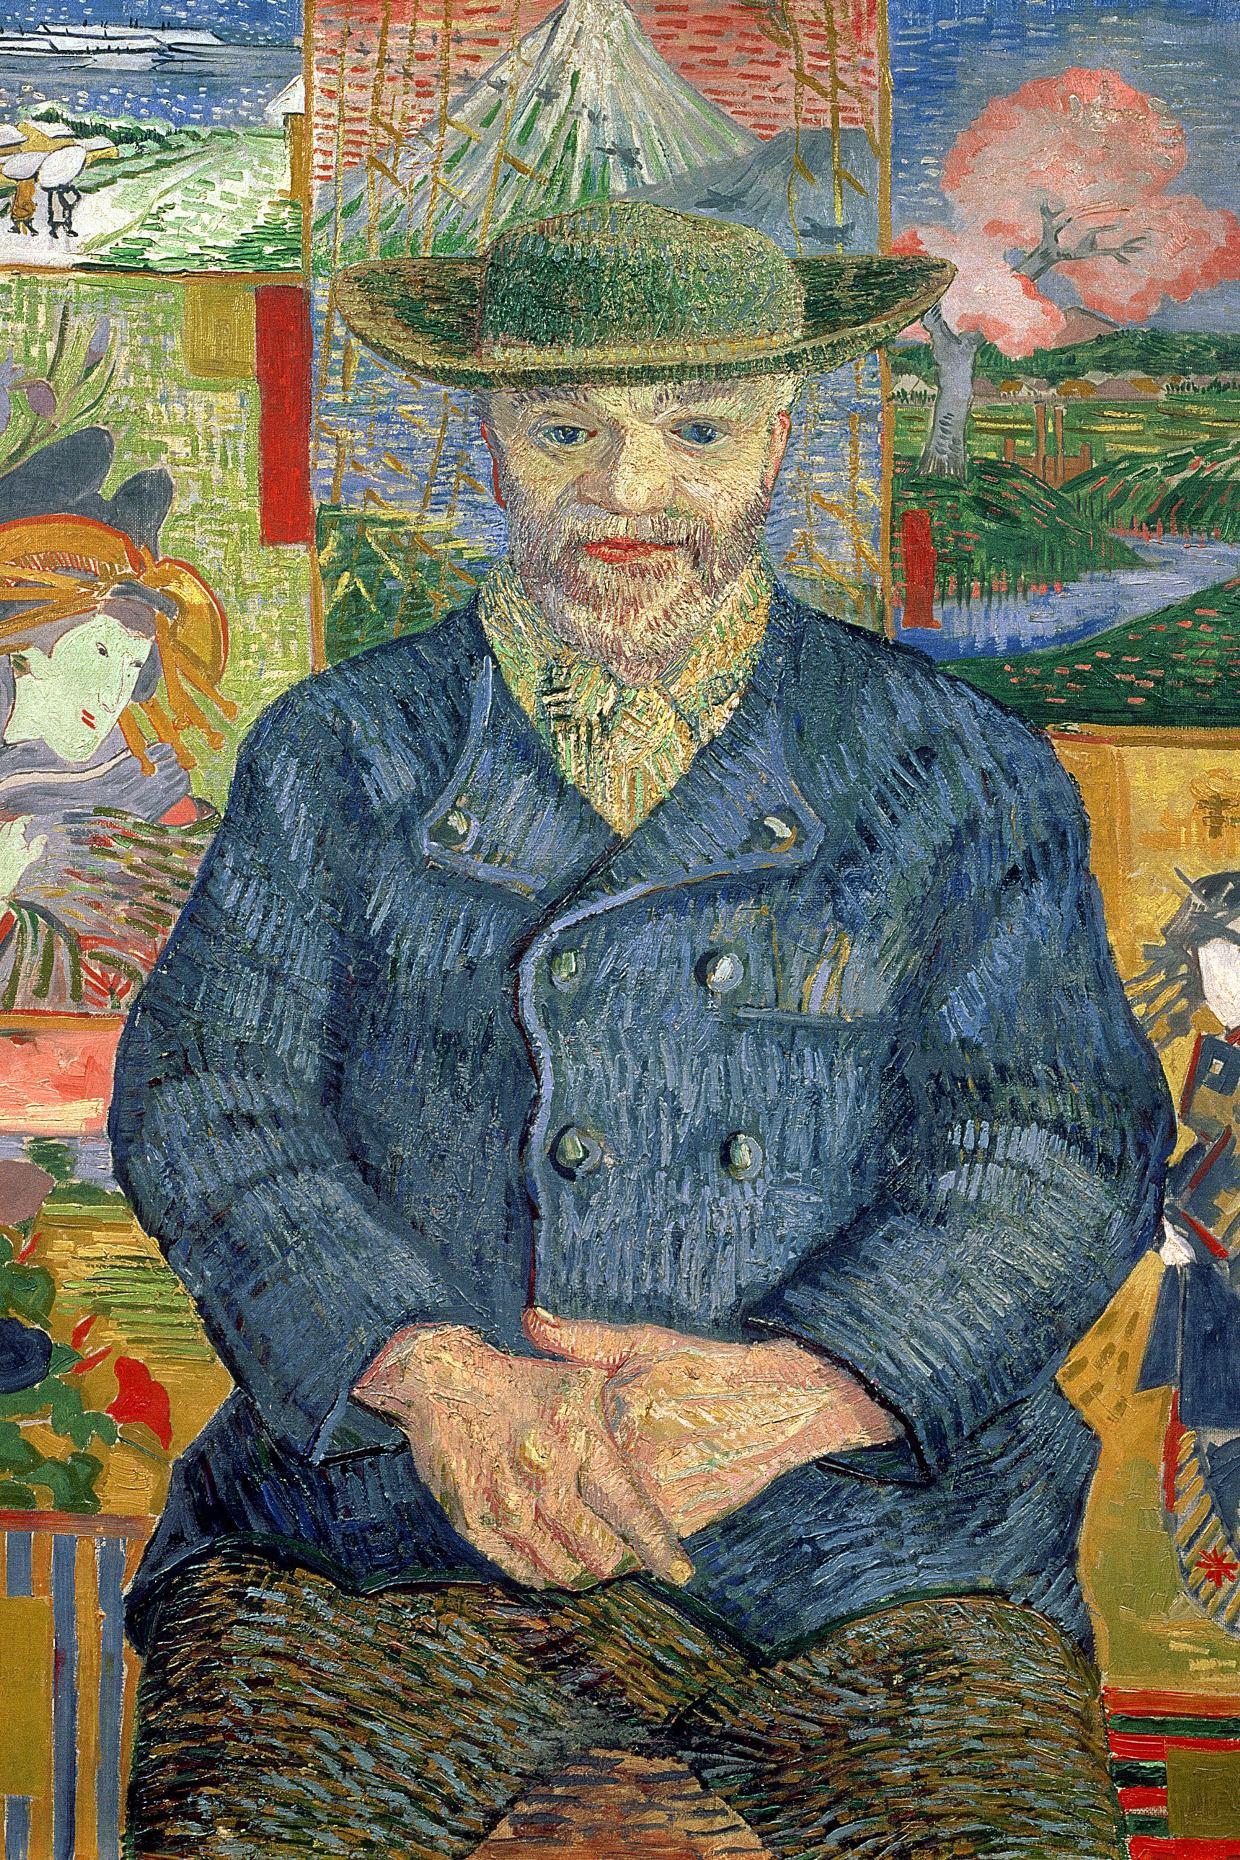 Sztuka na Ekranie: Van Gogh i Japonia